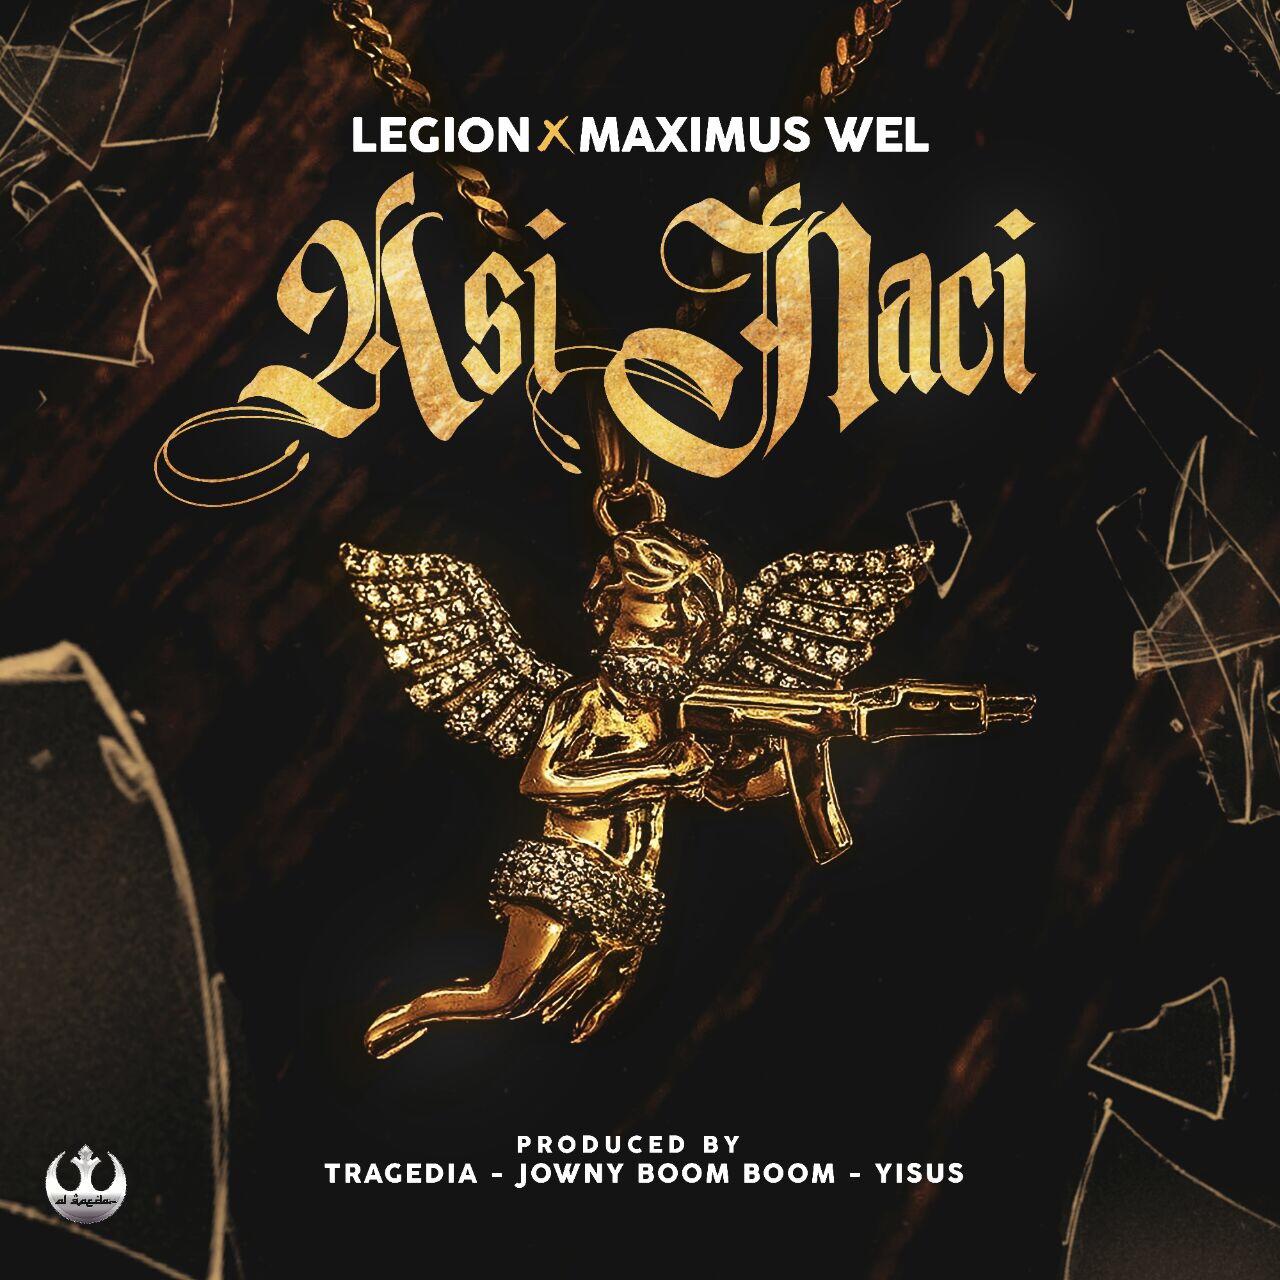 Legion Ft. Maximus Wel - Asi Naci MP3